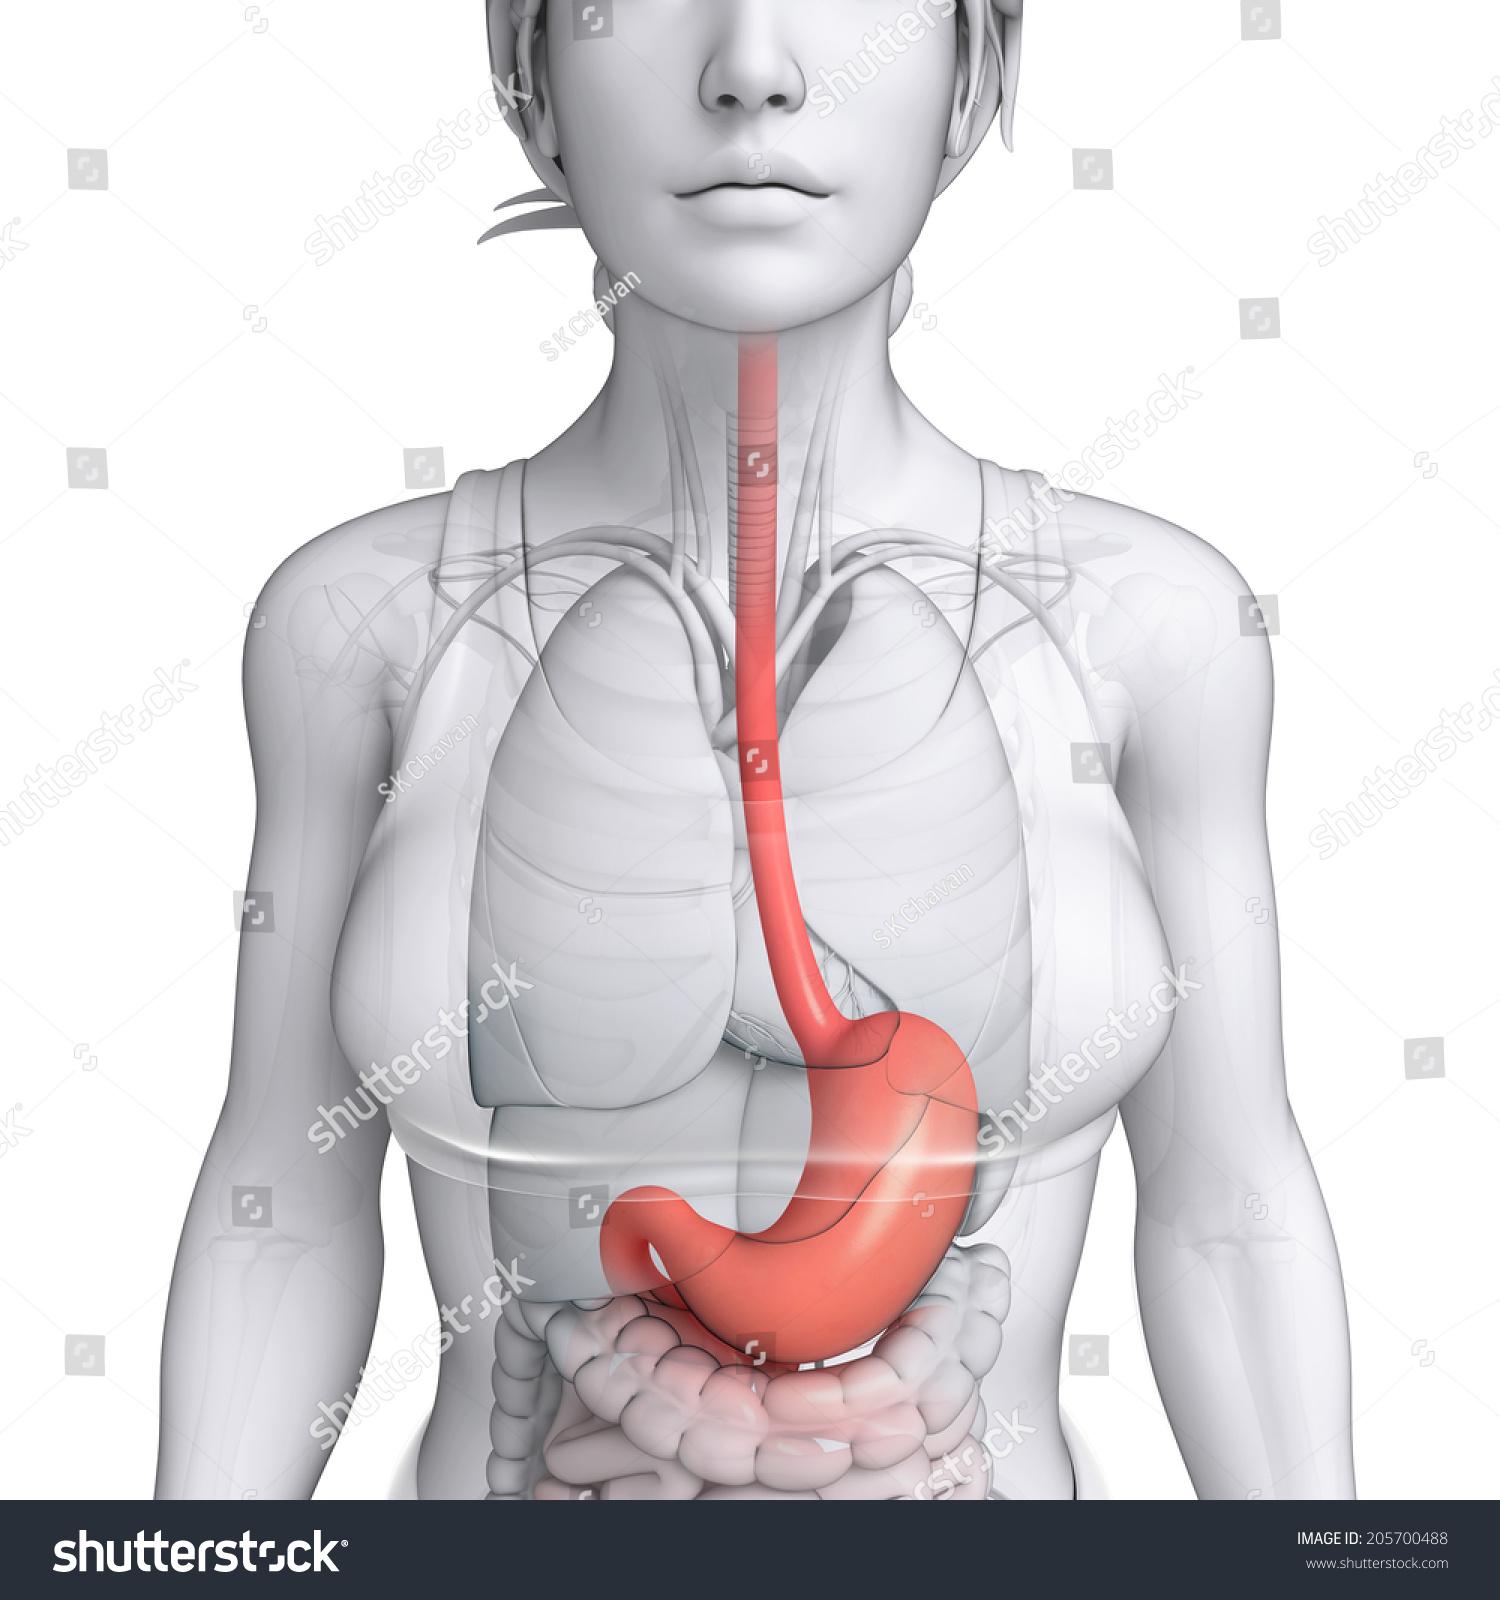 Illustration Female Stomach Anatomy Stock Illustration 205700488 ...